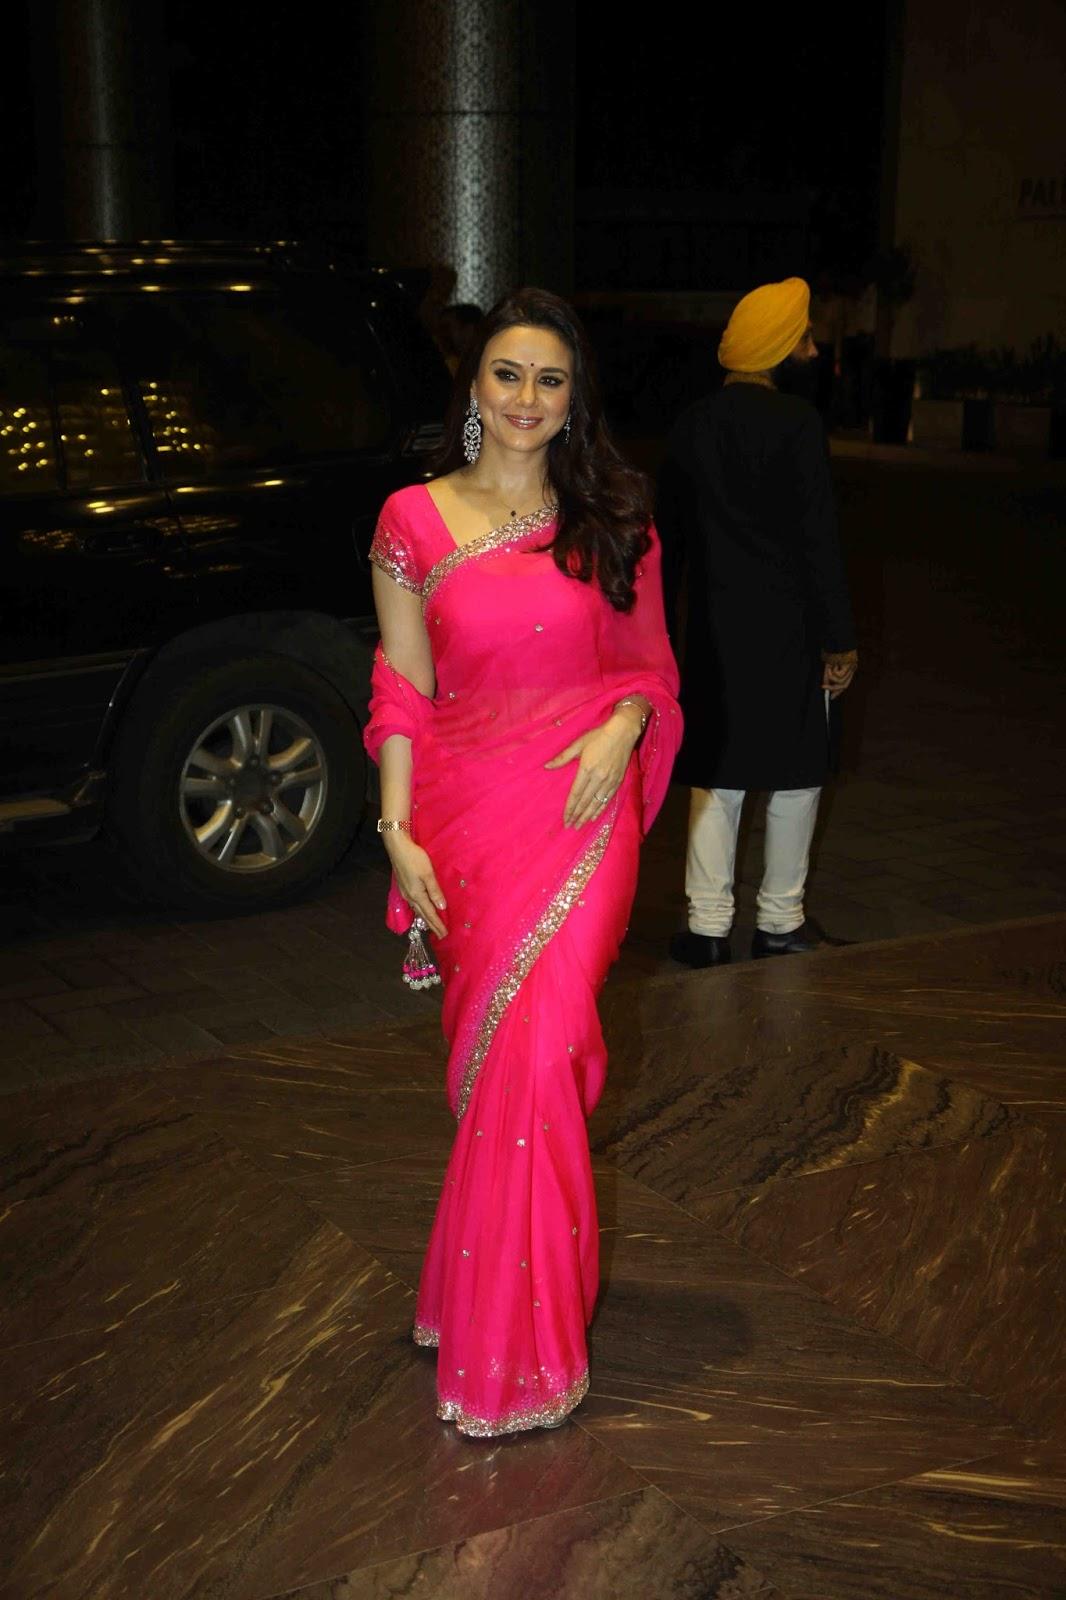 fit-girls-preity-zinta-bollywood-actress-nude-celeb